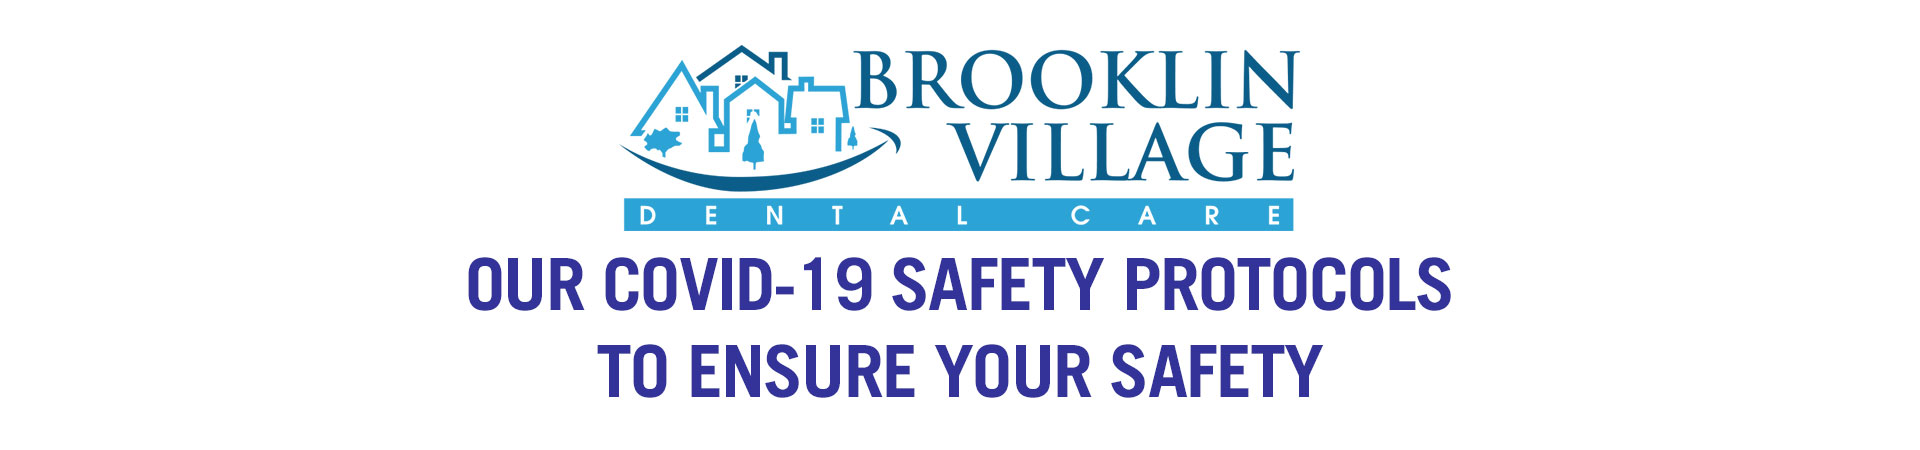 Brooklin Village Dental Care COVID-19 Safety Protocols